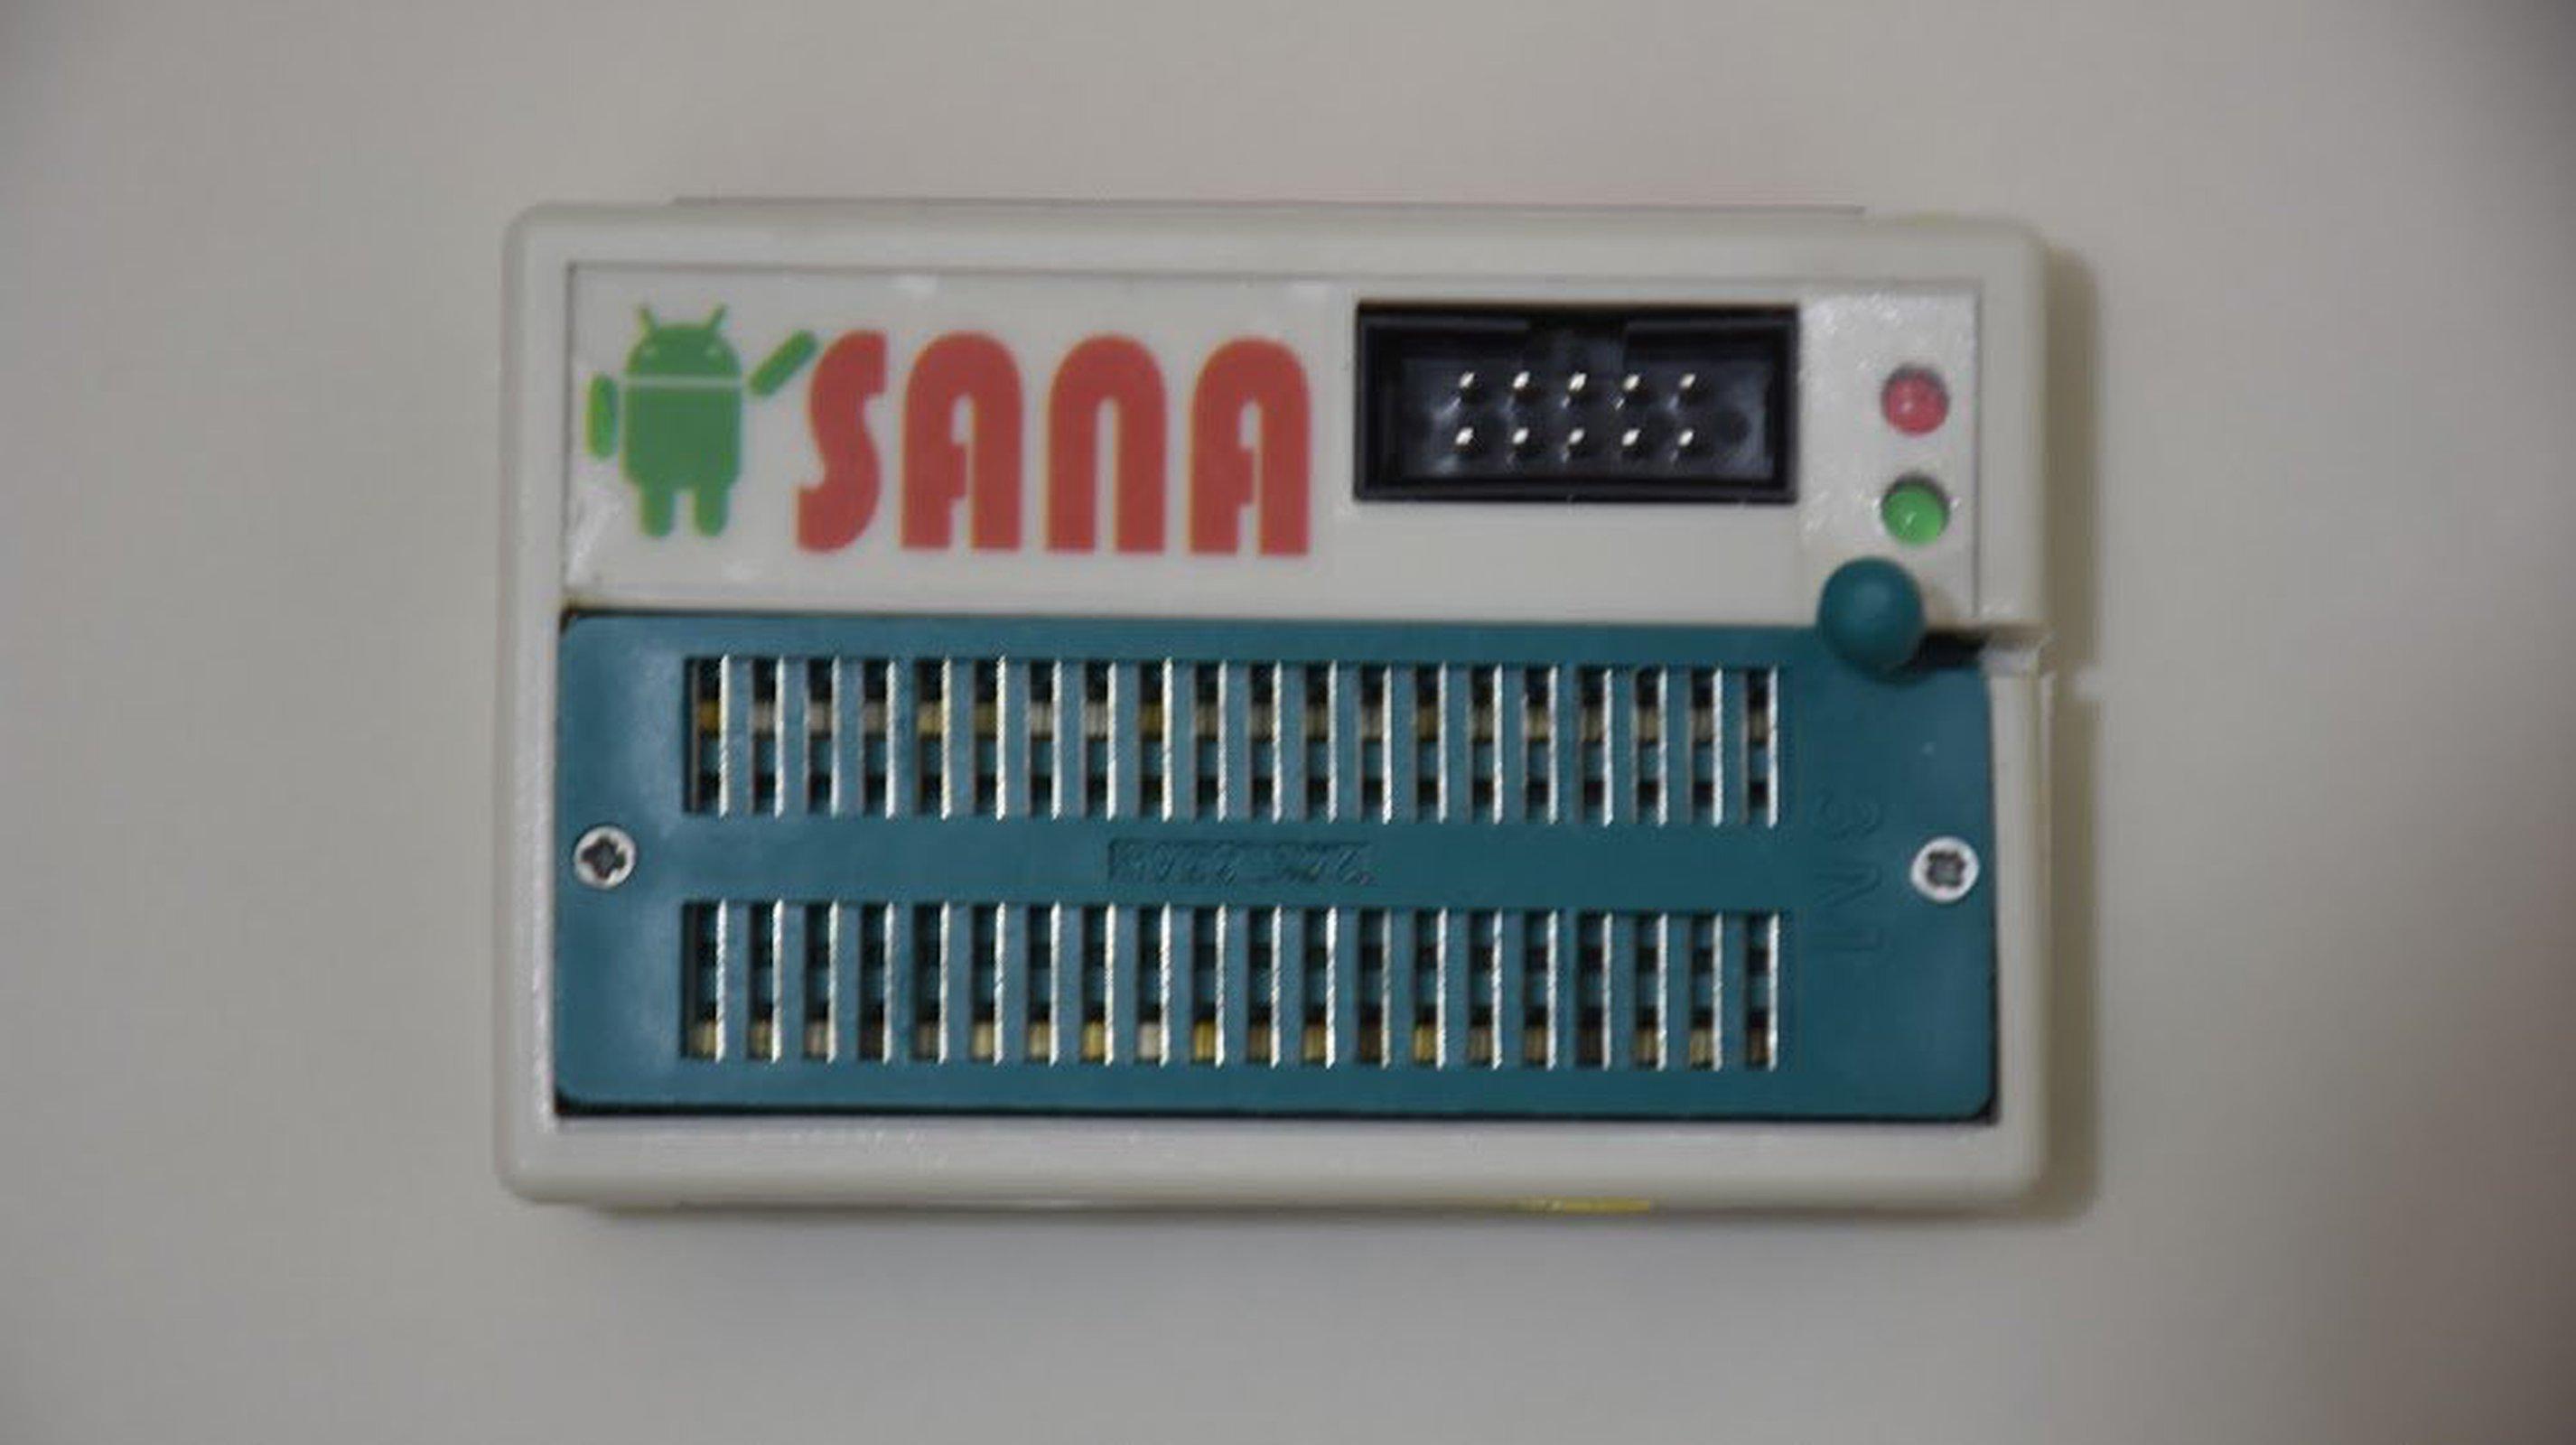 Sana Ic Tester Usbasp Programmeravr 2493cxx From Hossein Lachini Atmel Usb Programmer Circuit Zif Socket Atmega8 2 7